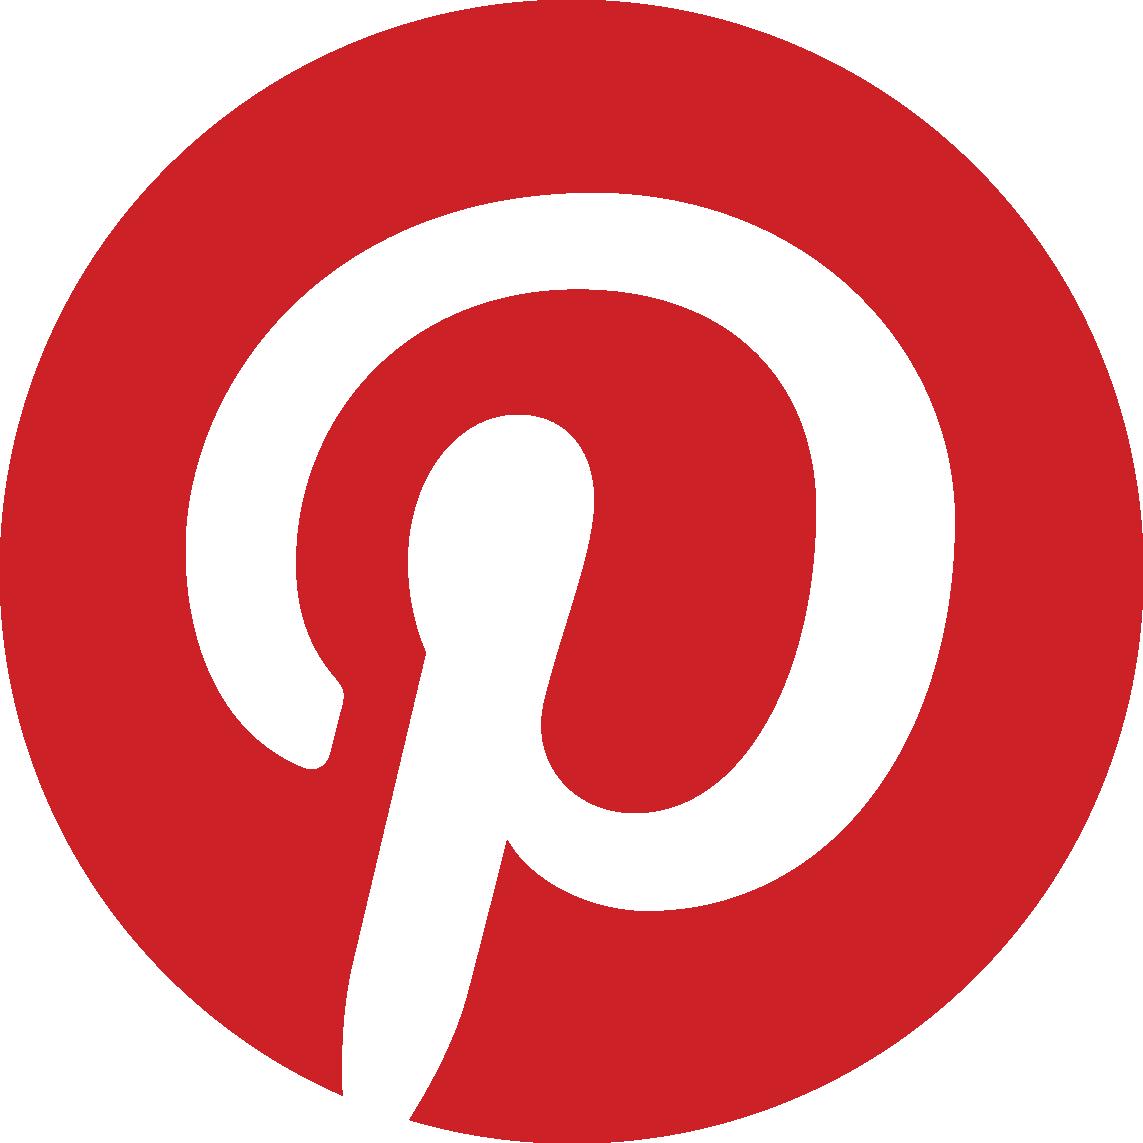 pinterest-logo-png-9.png